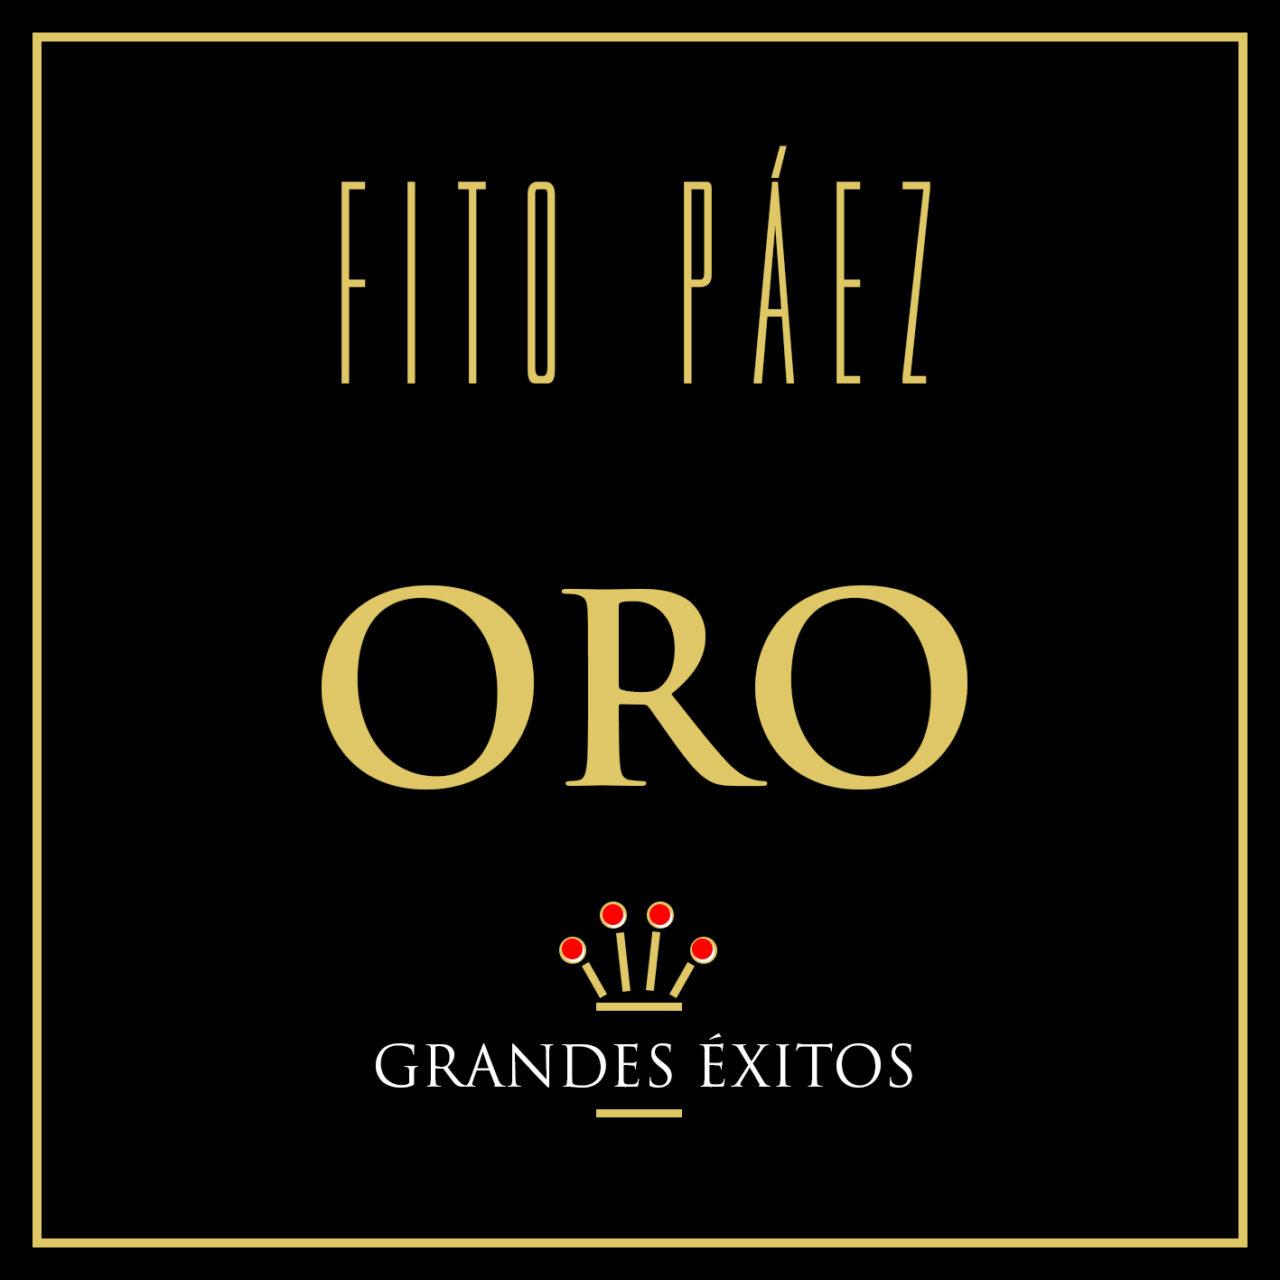 Fito Paez ORO CD